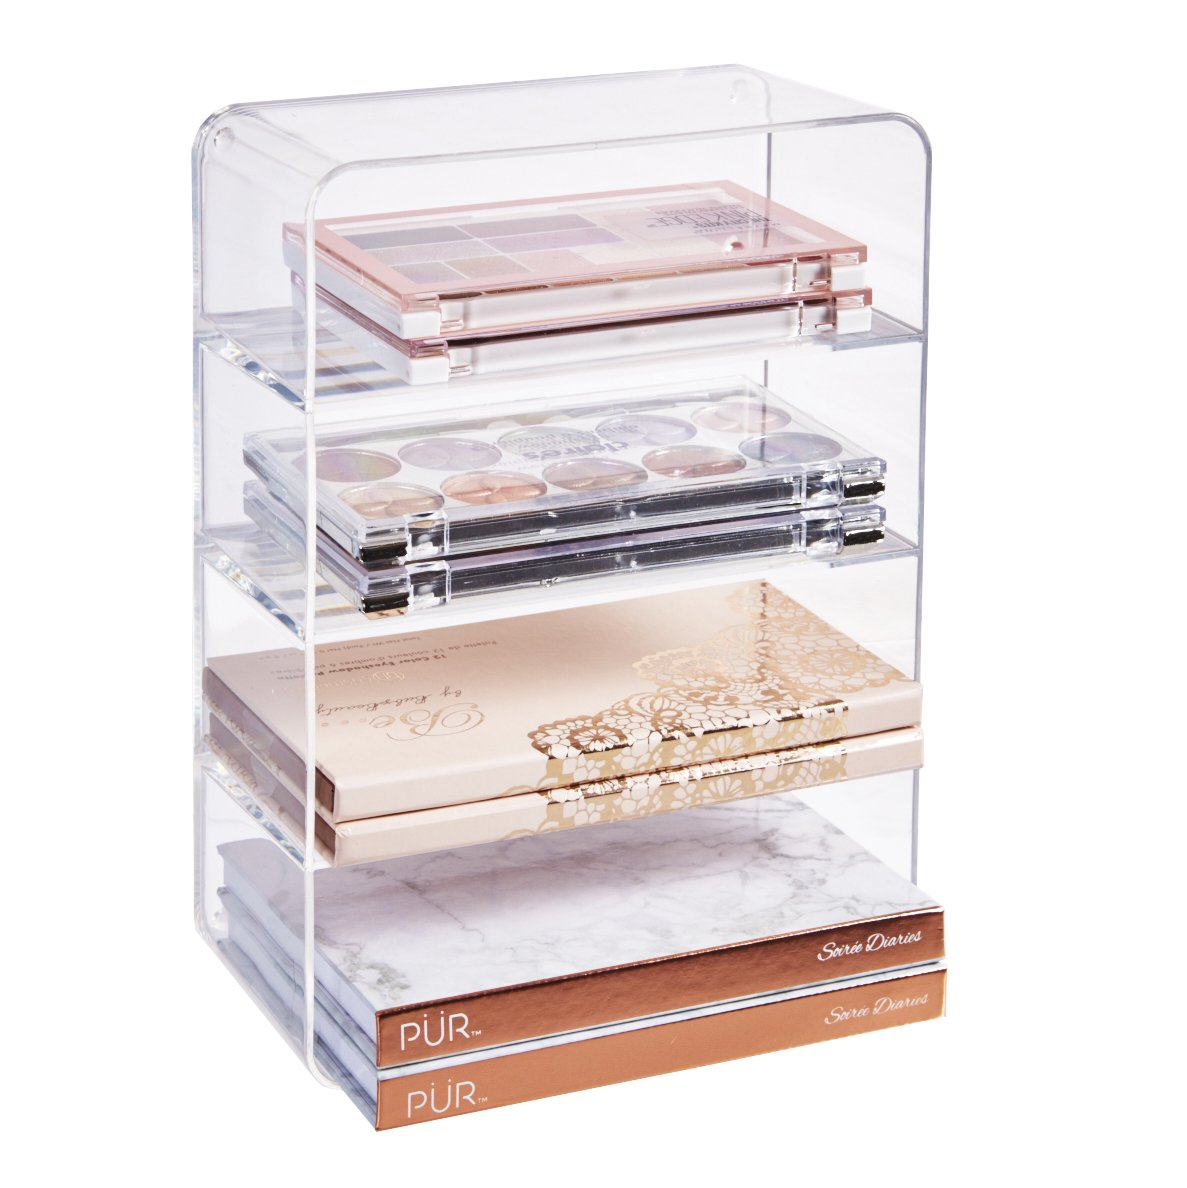 STORi Clear Plastic Makeup Palette Vanity Organizer | 4-Compartments